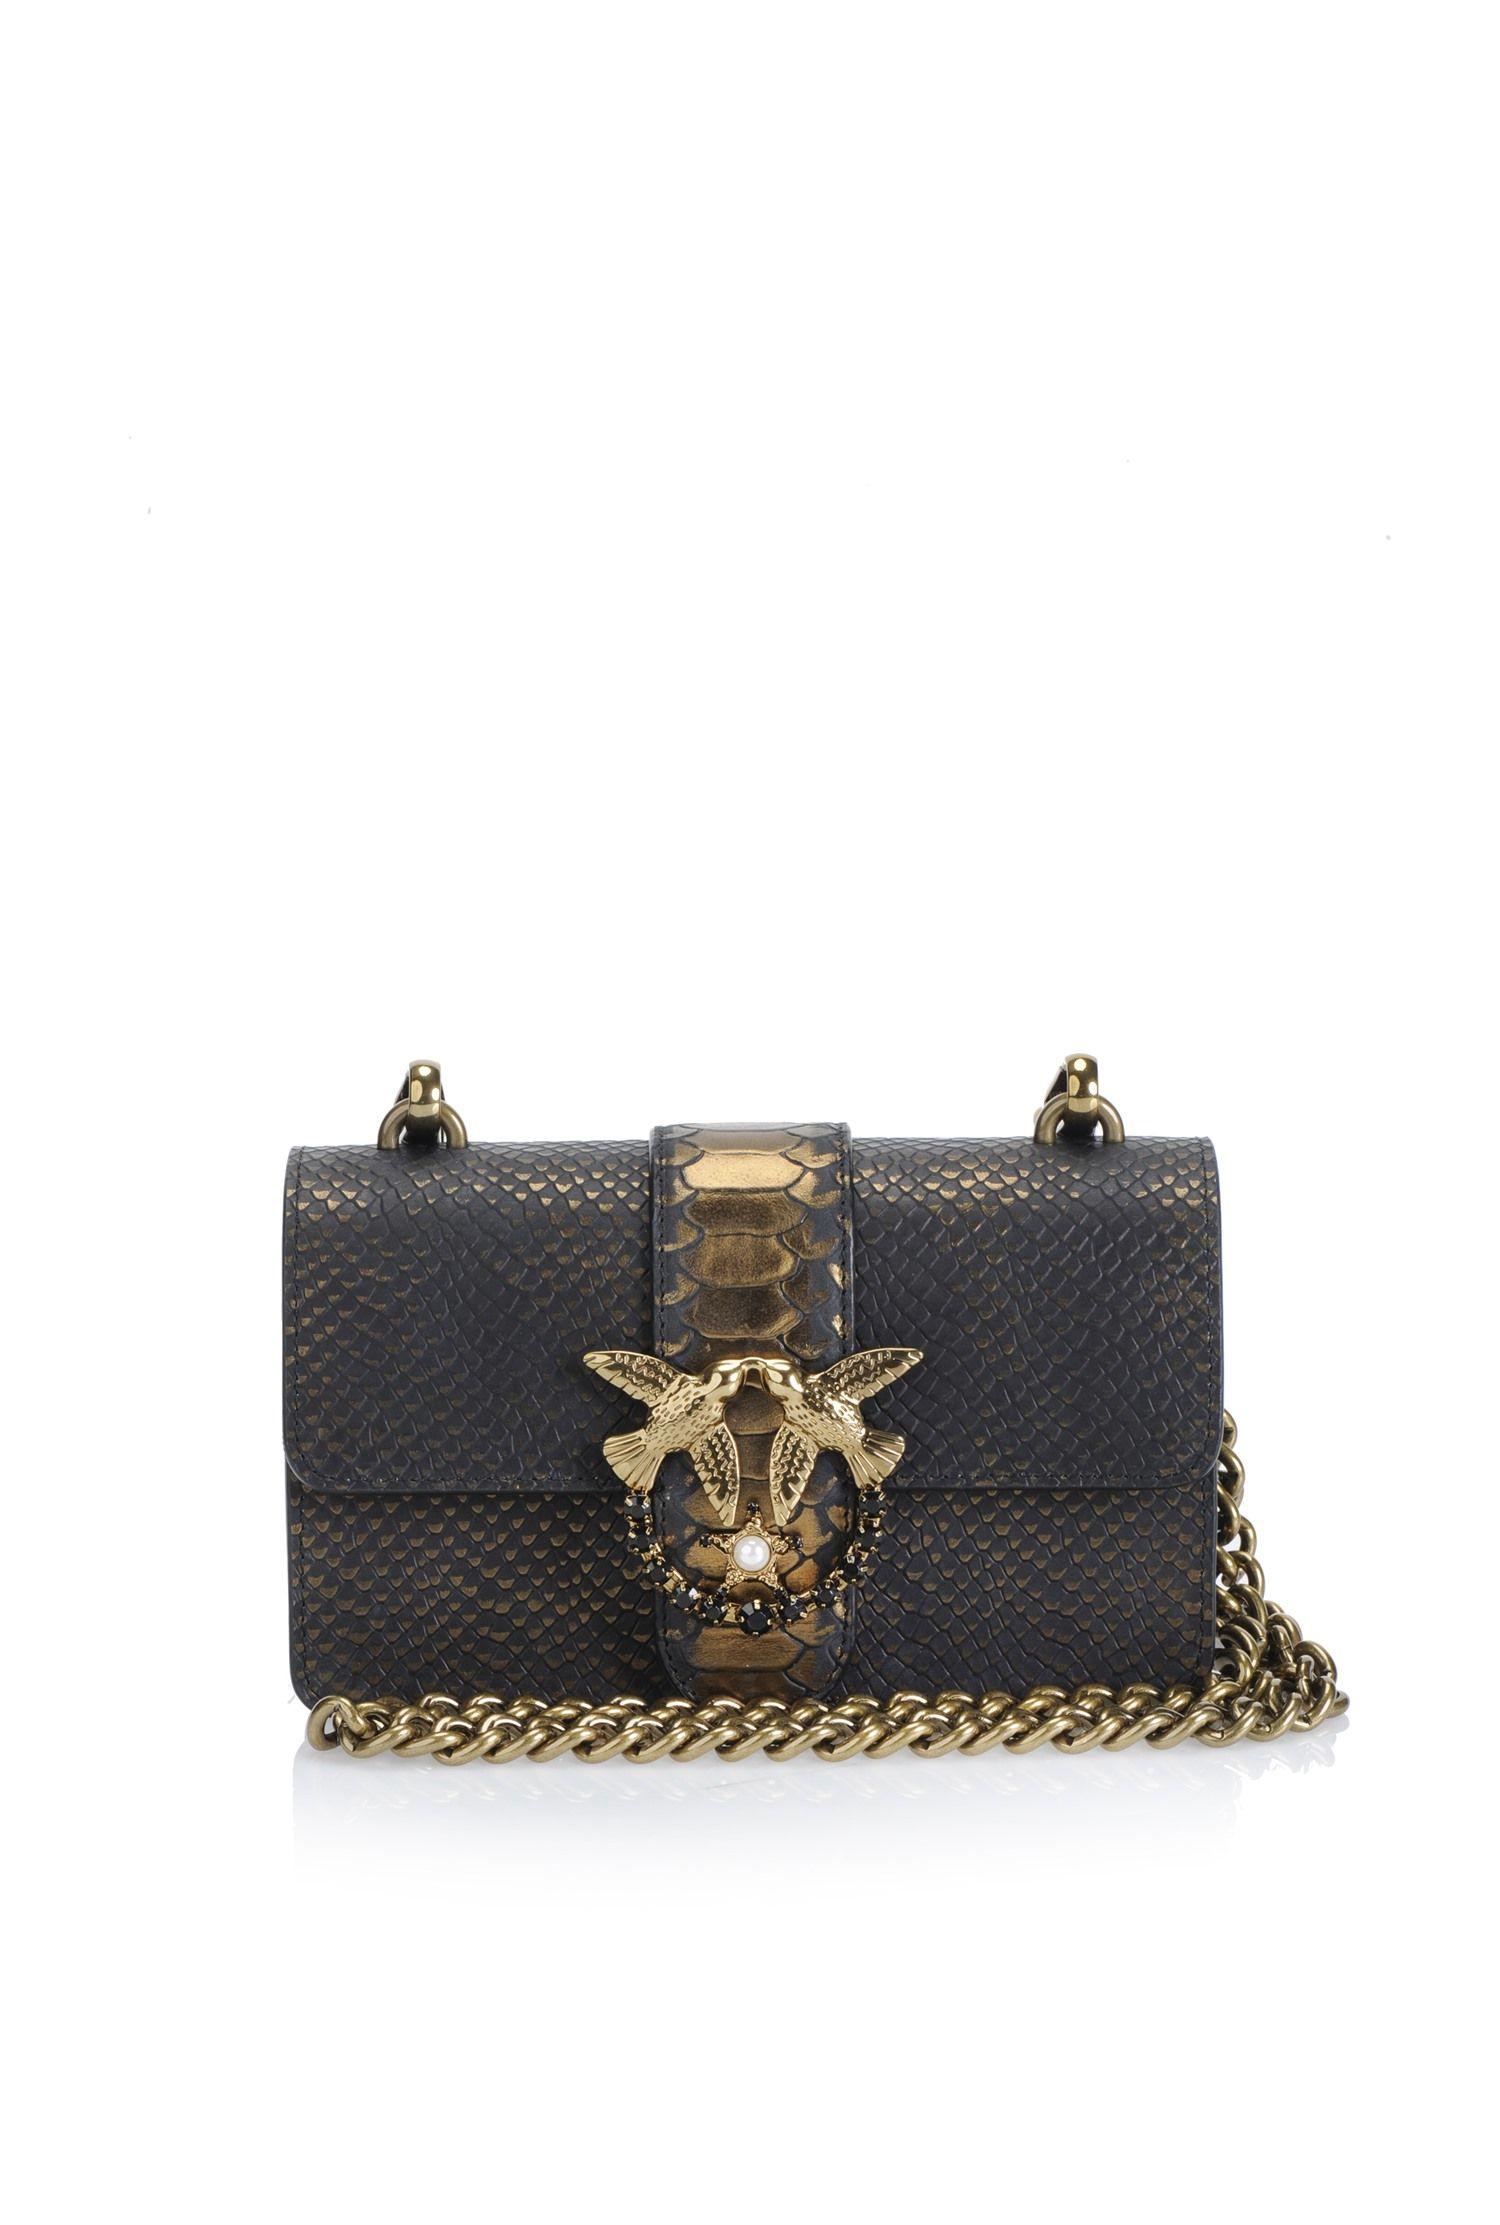 231506f32d483 Python print leather Mini Love Bag Bronze